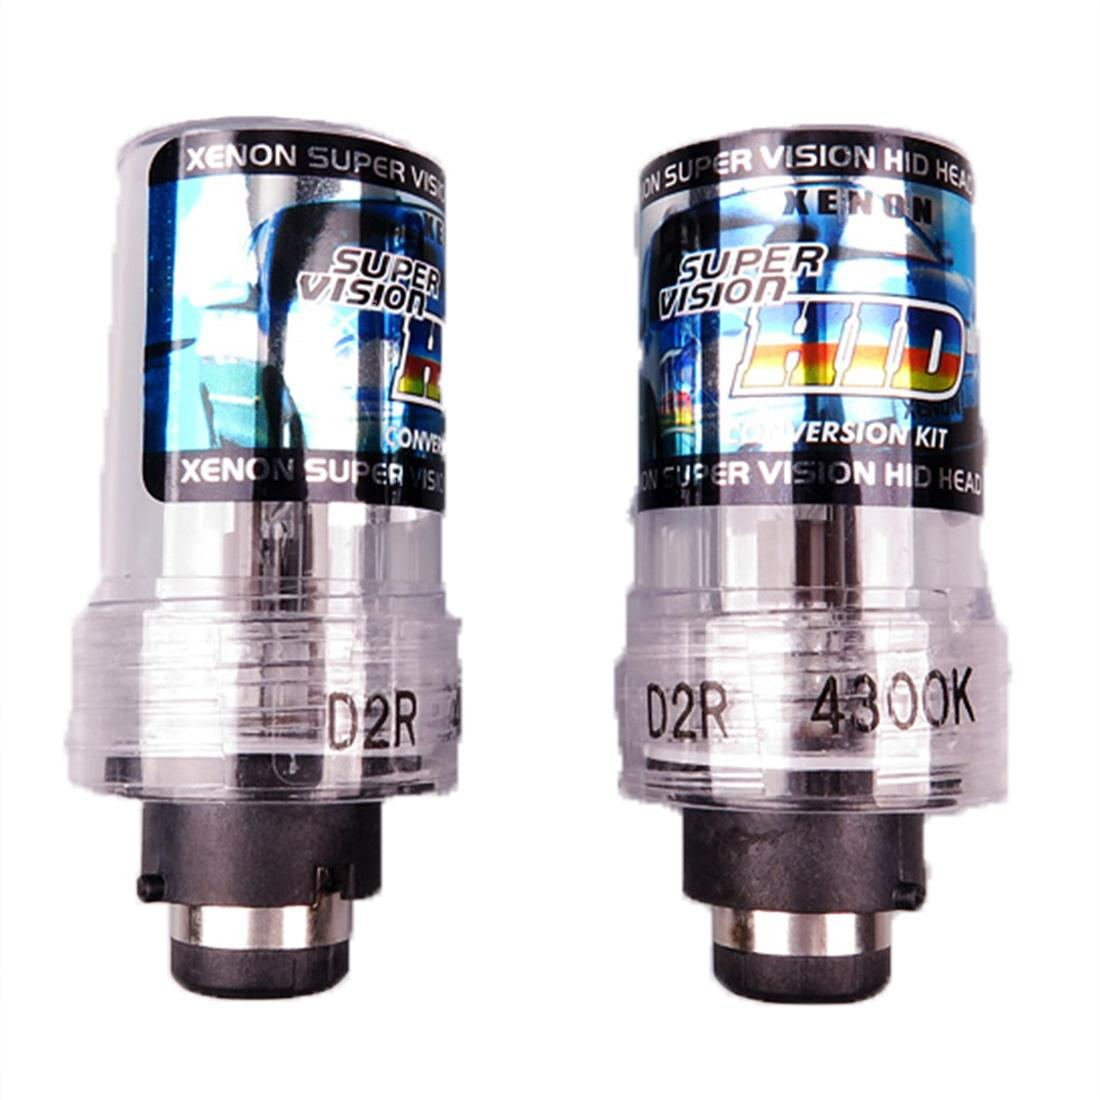 Lousunhid Car Accessory HID Xenon Headlamp Headlight 2 Lamp In 1 Pack D2R-6000K-35W